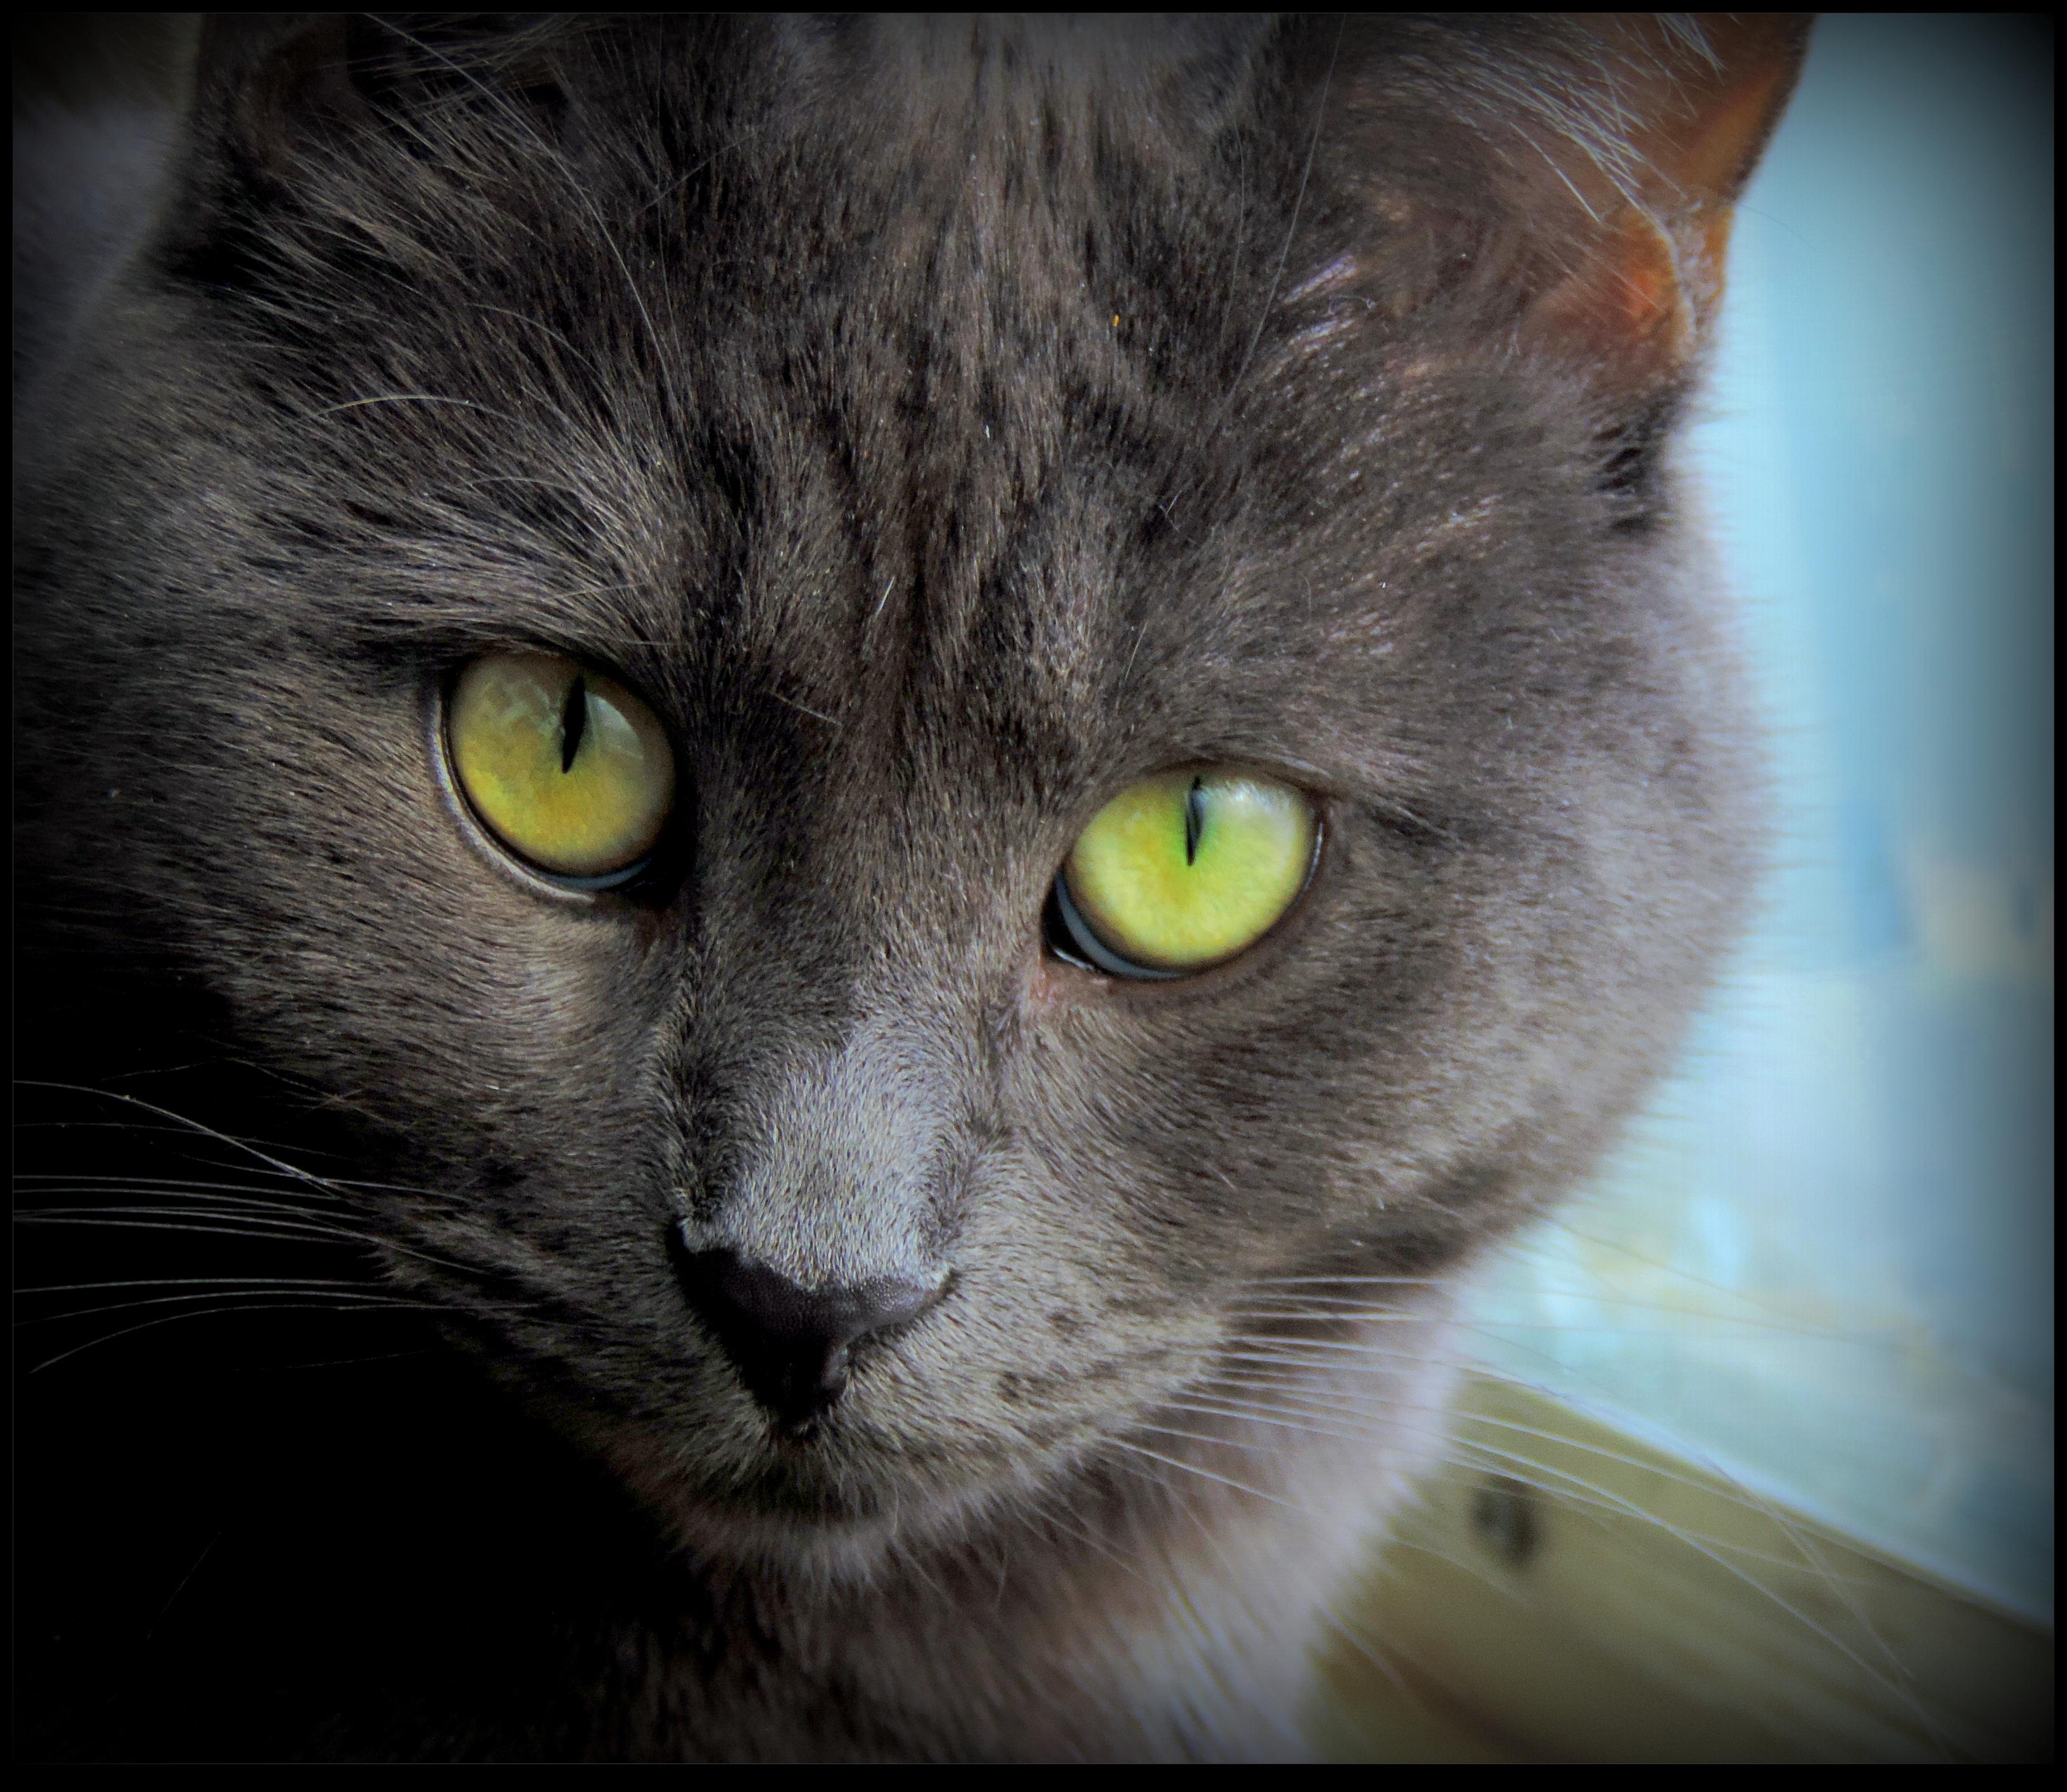 My Cat's Stare by JocelyneR